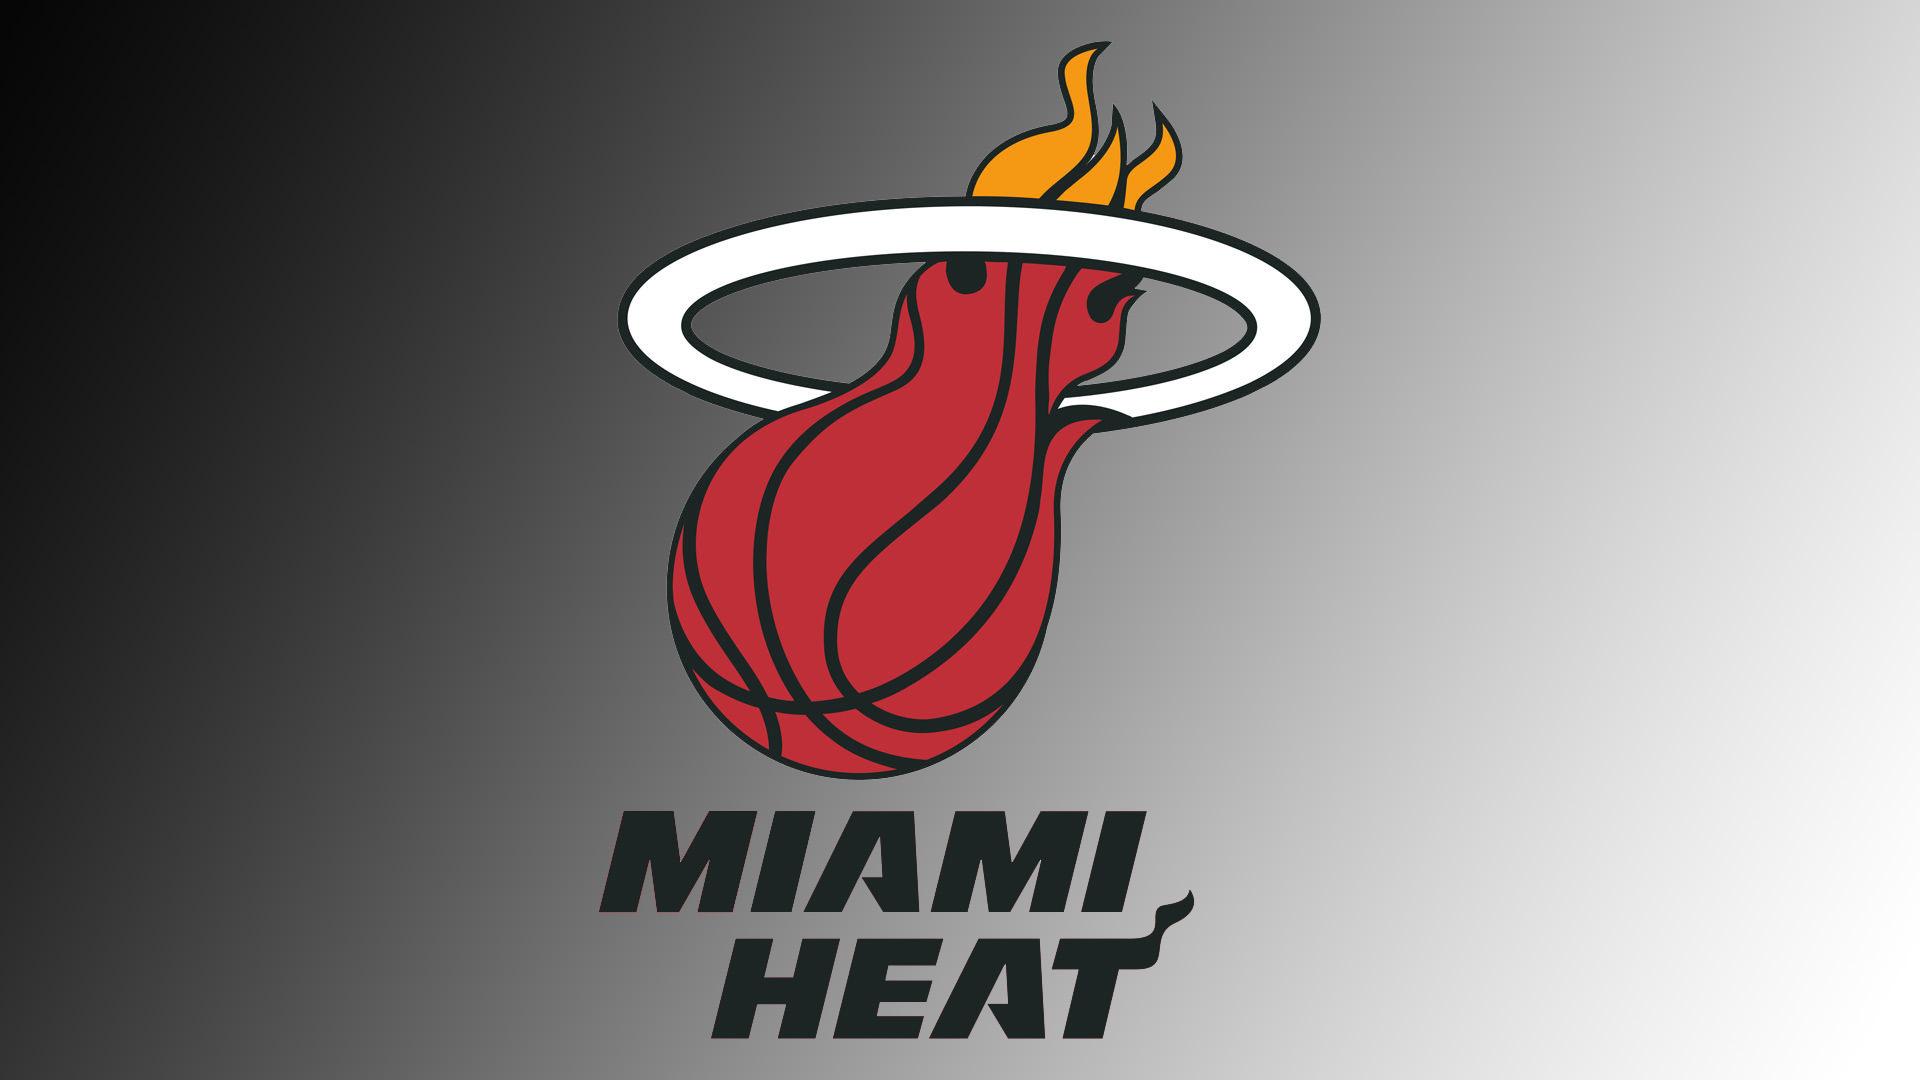 Miami Heat Logo Wallpaper HD 21 hd background hd screensavers hd 1920x1080